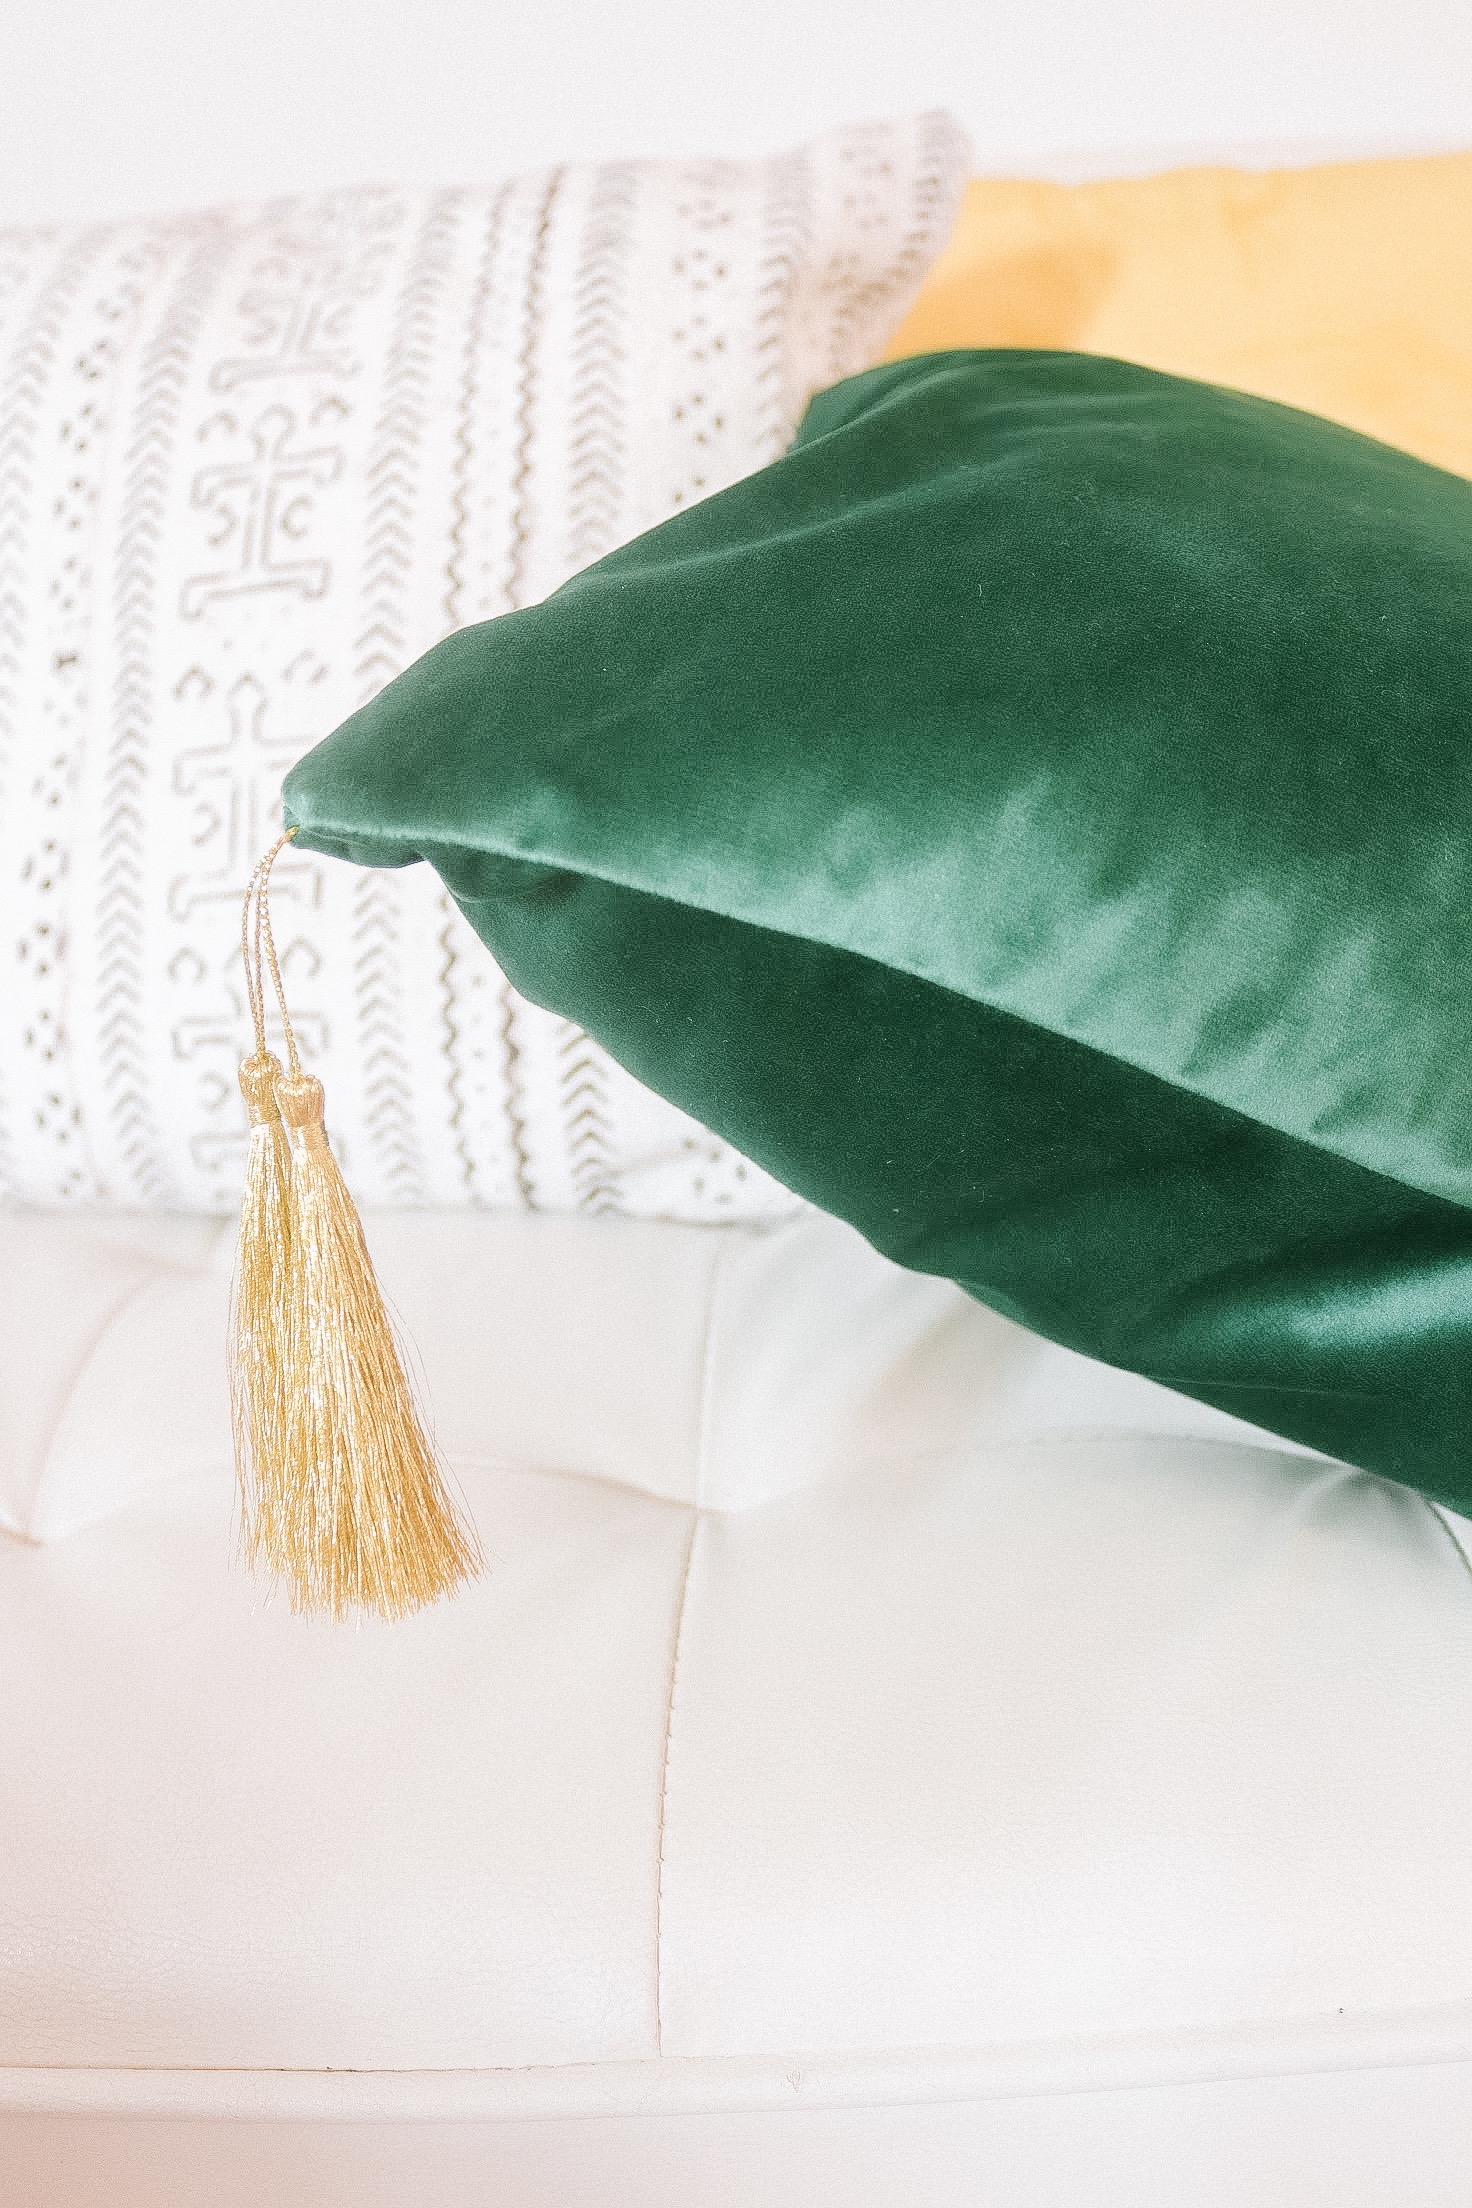 karama holistic home decor lifestyle mind body home shop all tassel velvet pillow emerald